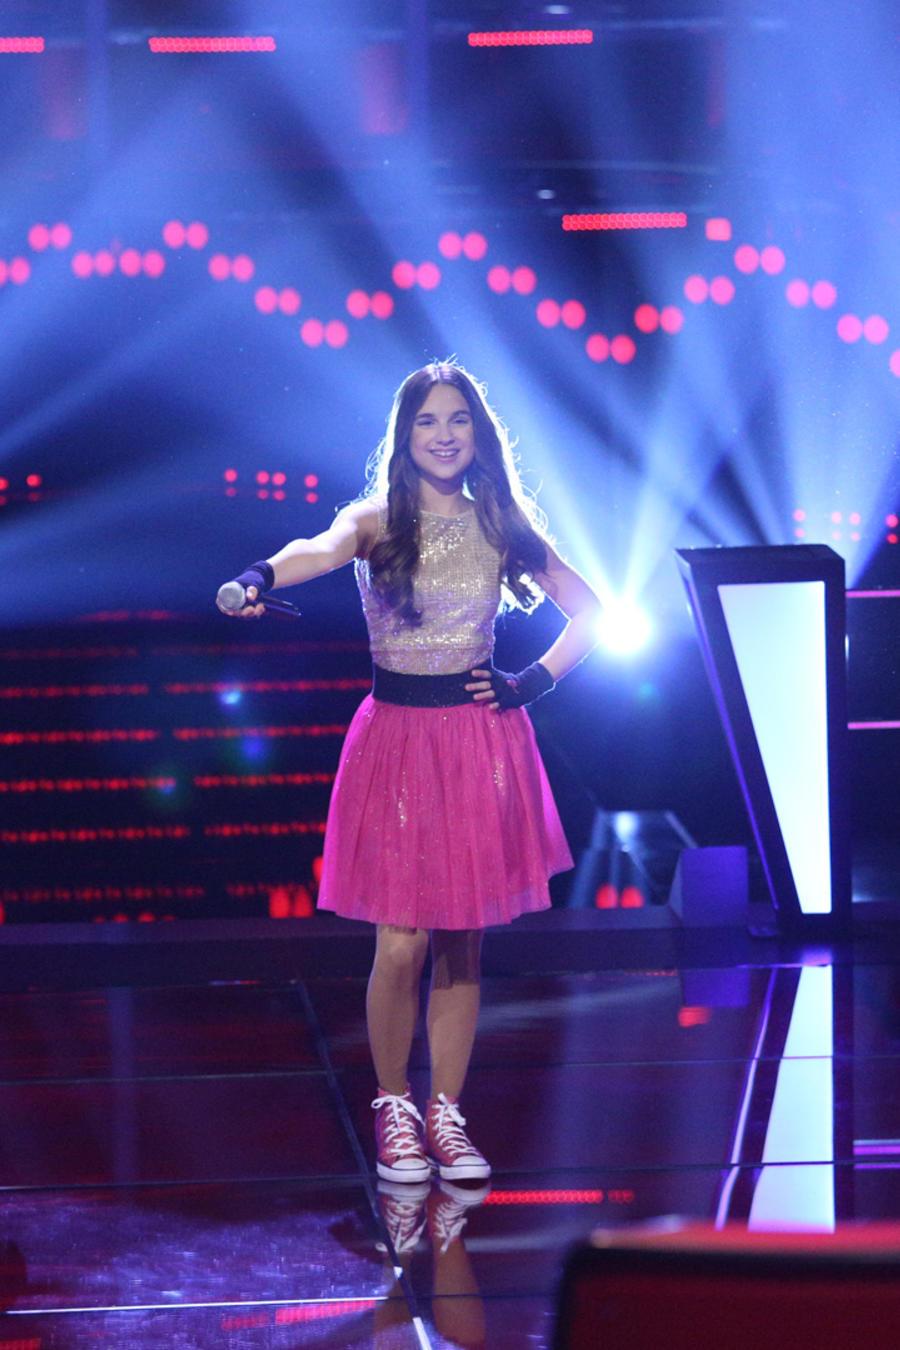 Valeria Cruz Valeria Jauregui Valeria Aviles en la tercera ronda de batallas de La Voz Kids